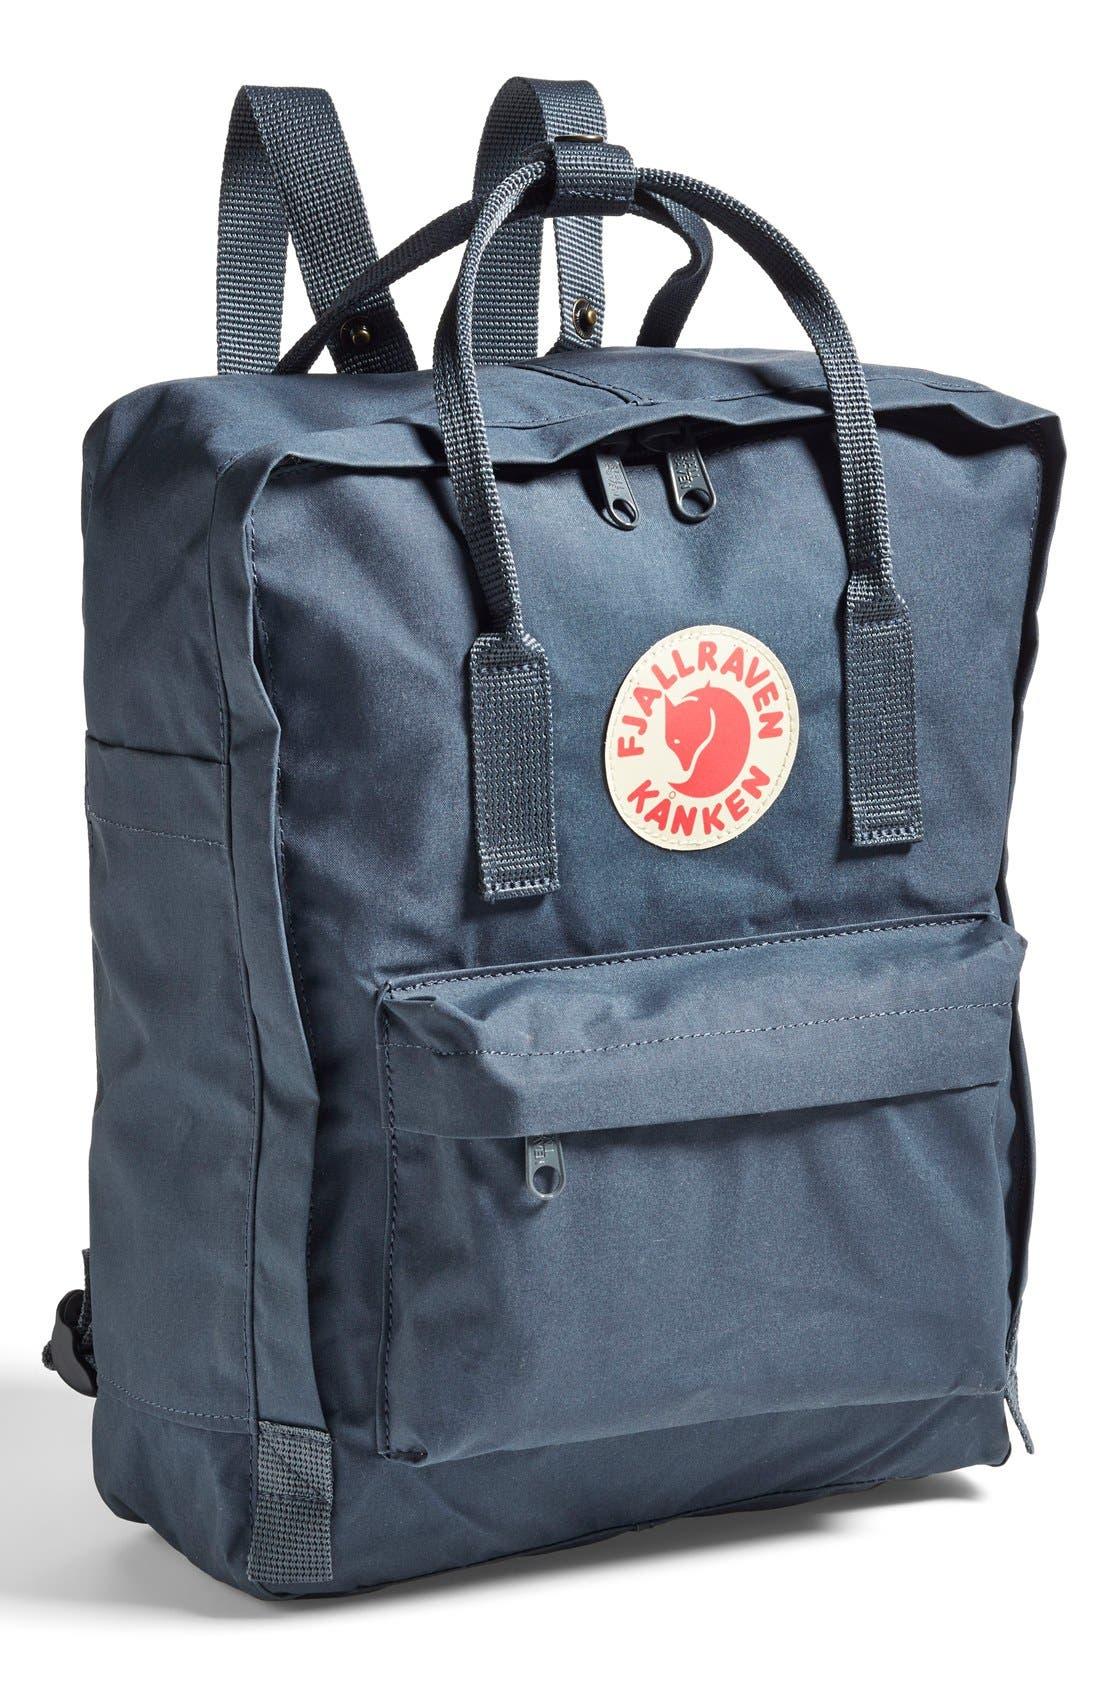 Alternate Image 1 Selected - Fjällräven 'Kånken' Water Resistant Backpack